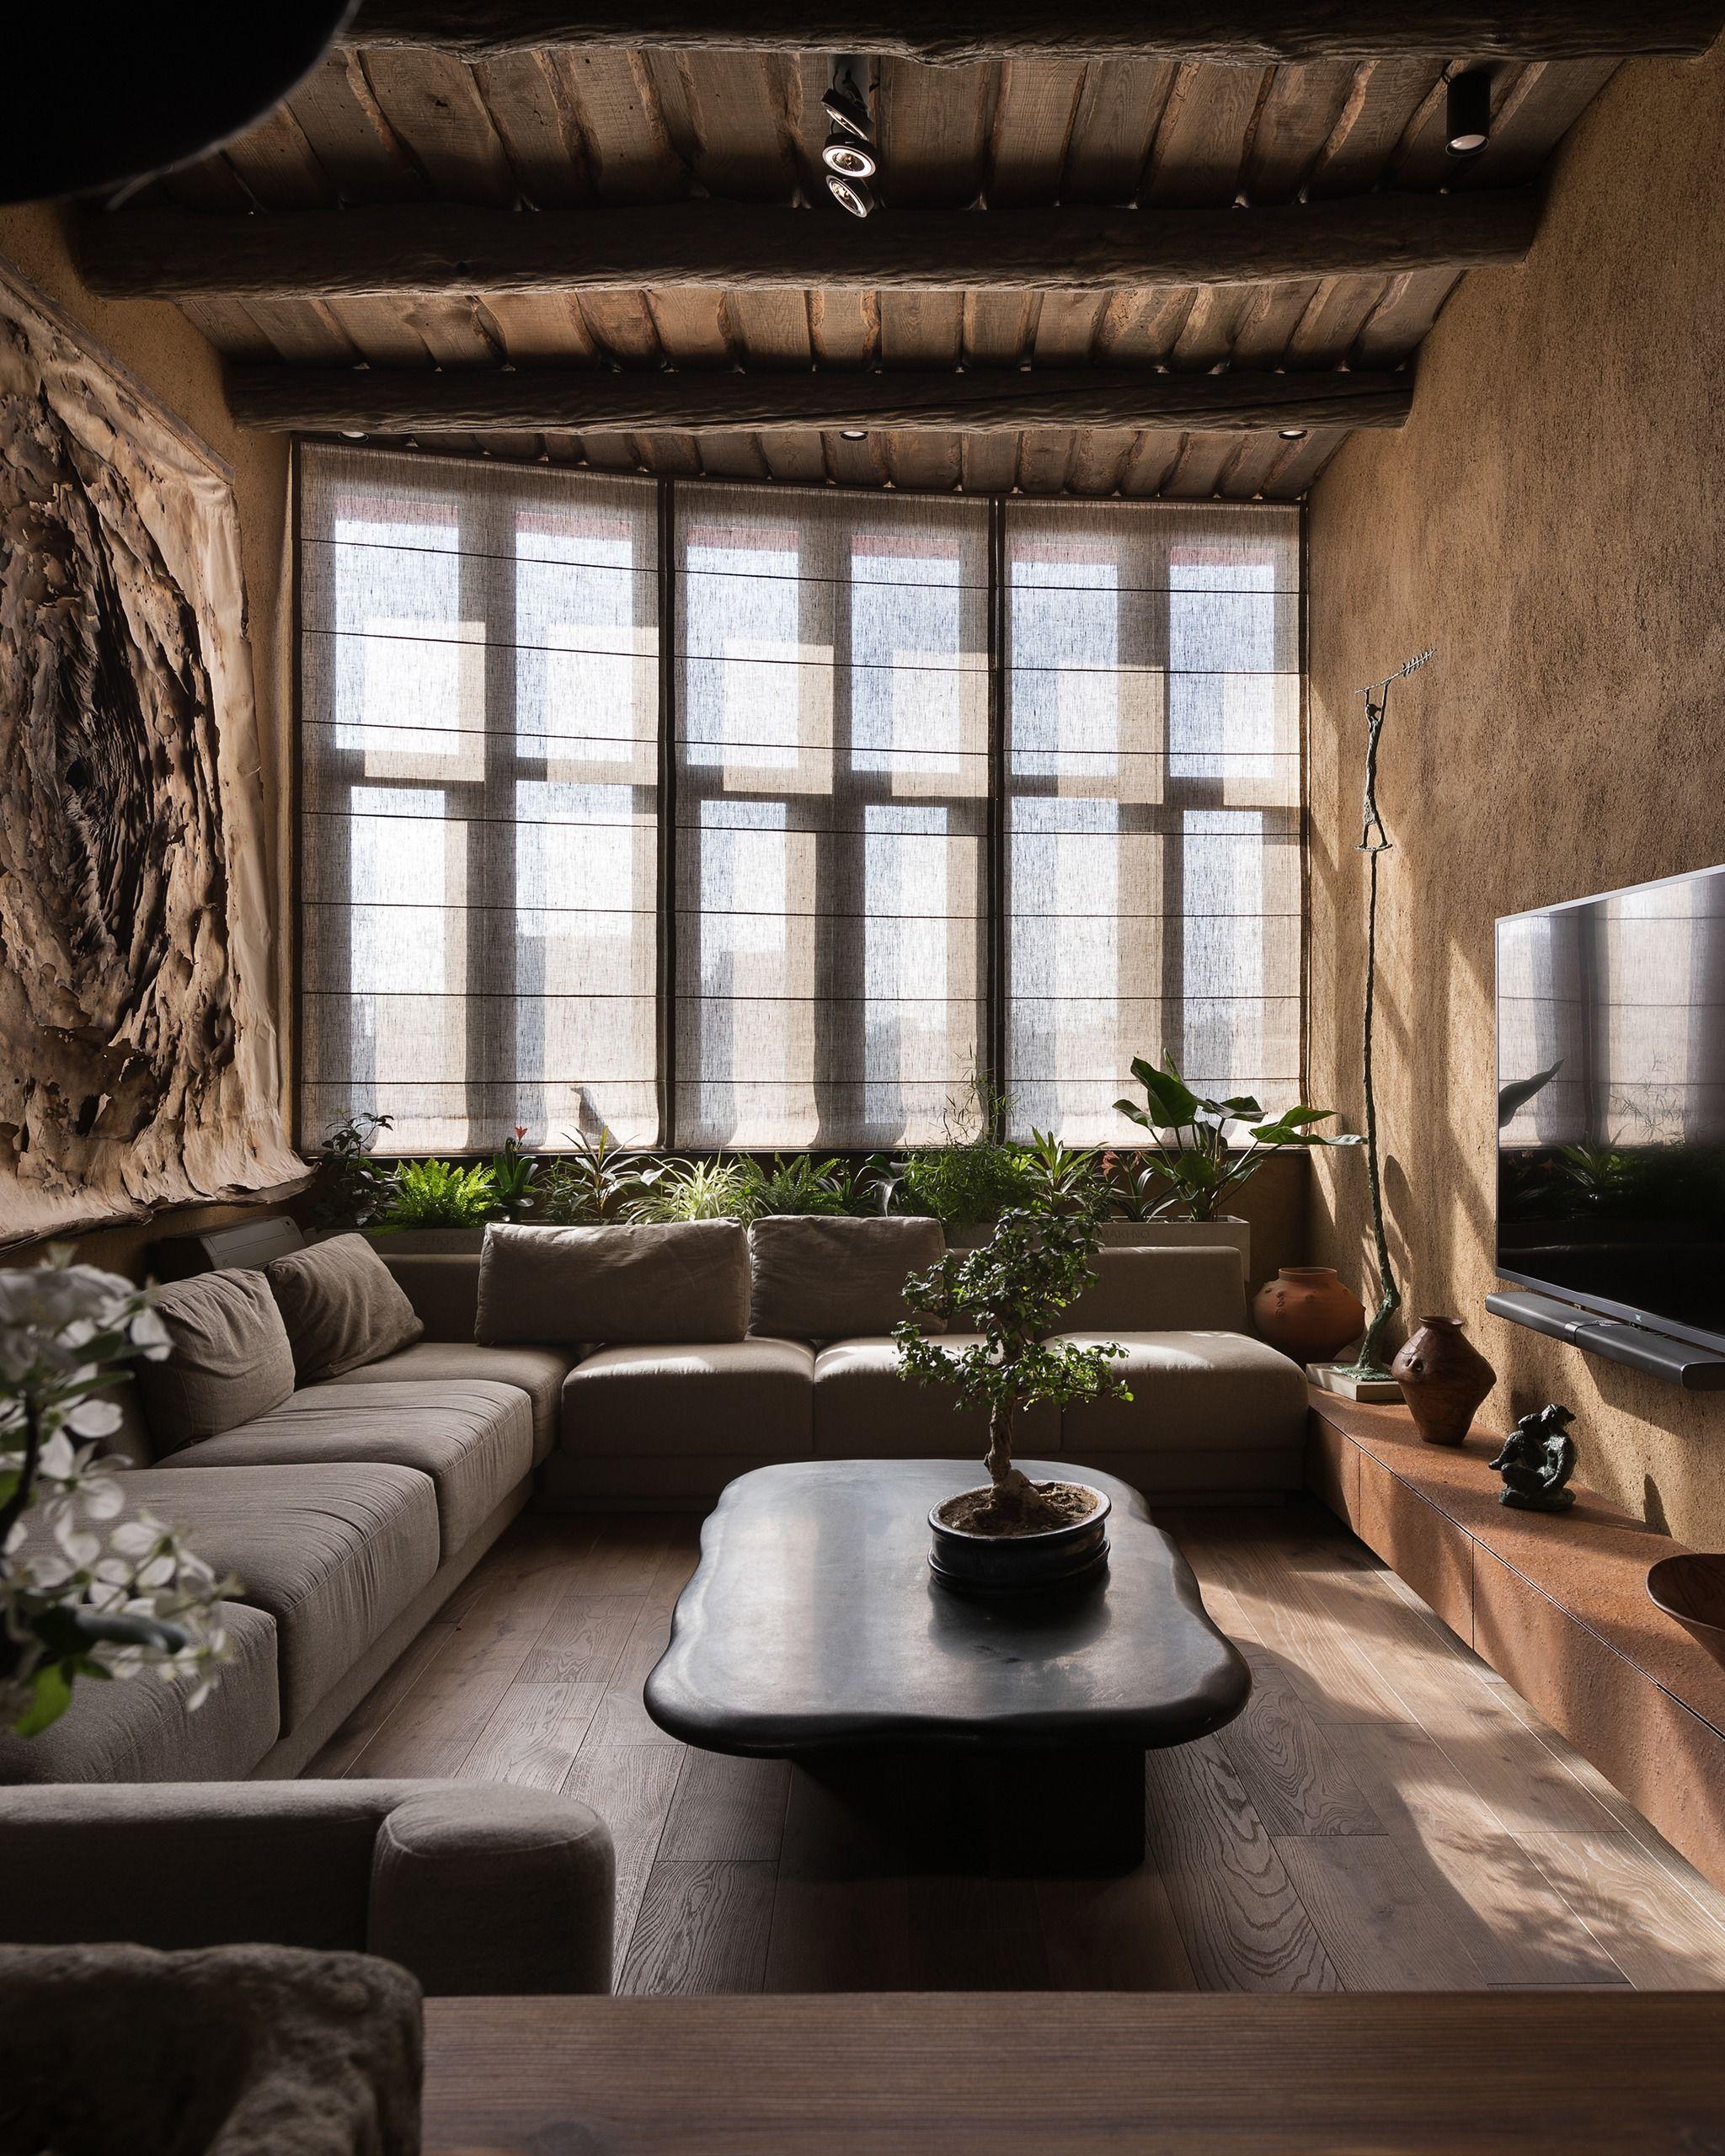 Zen Apartment Design Wabi Sabi Apartment Rustic Bedroom Design Apartment Design Zen decor living room